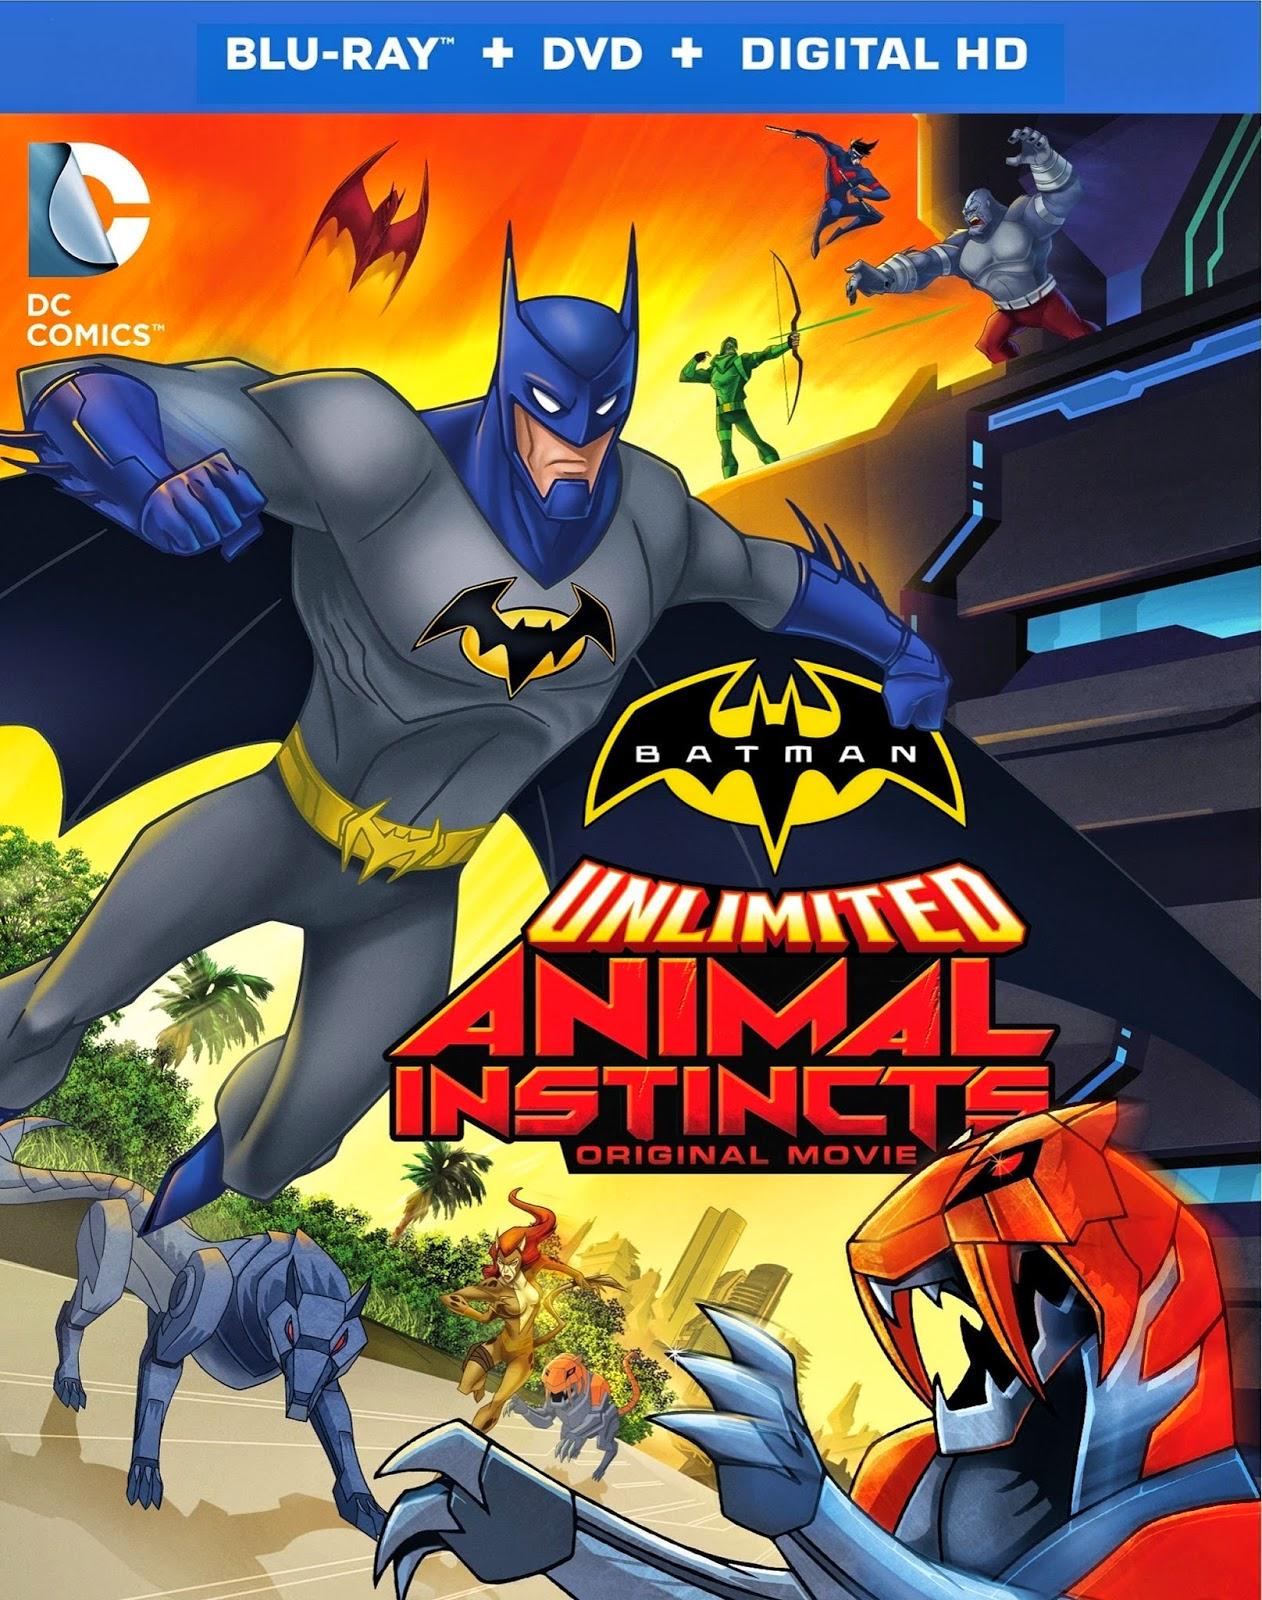 Batman Unlimited Animal Instincts แบทแมน ถล่มกองทัพอสูรเหล็ก [HD][พากย์ไทย]